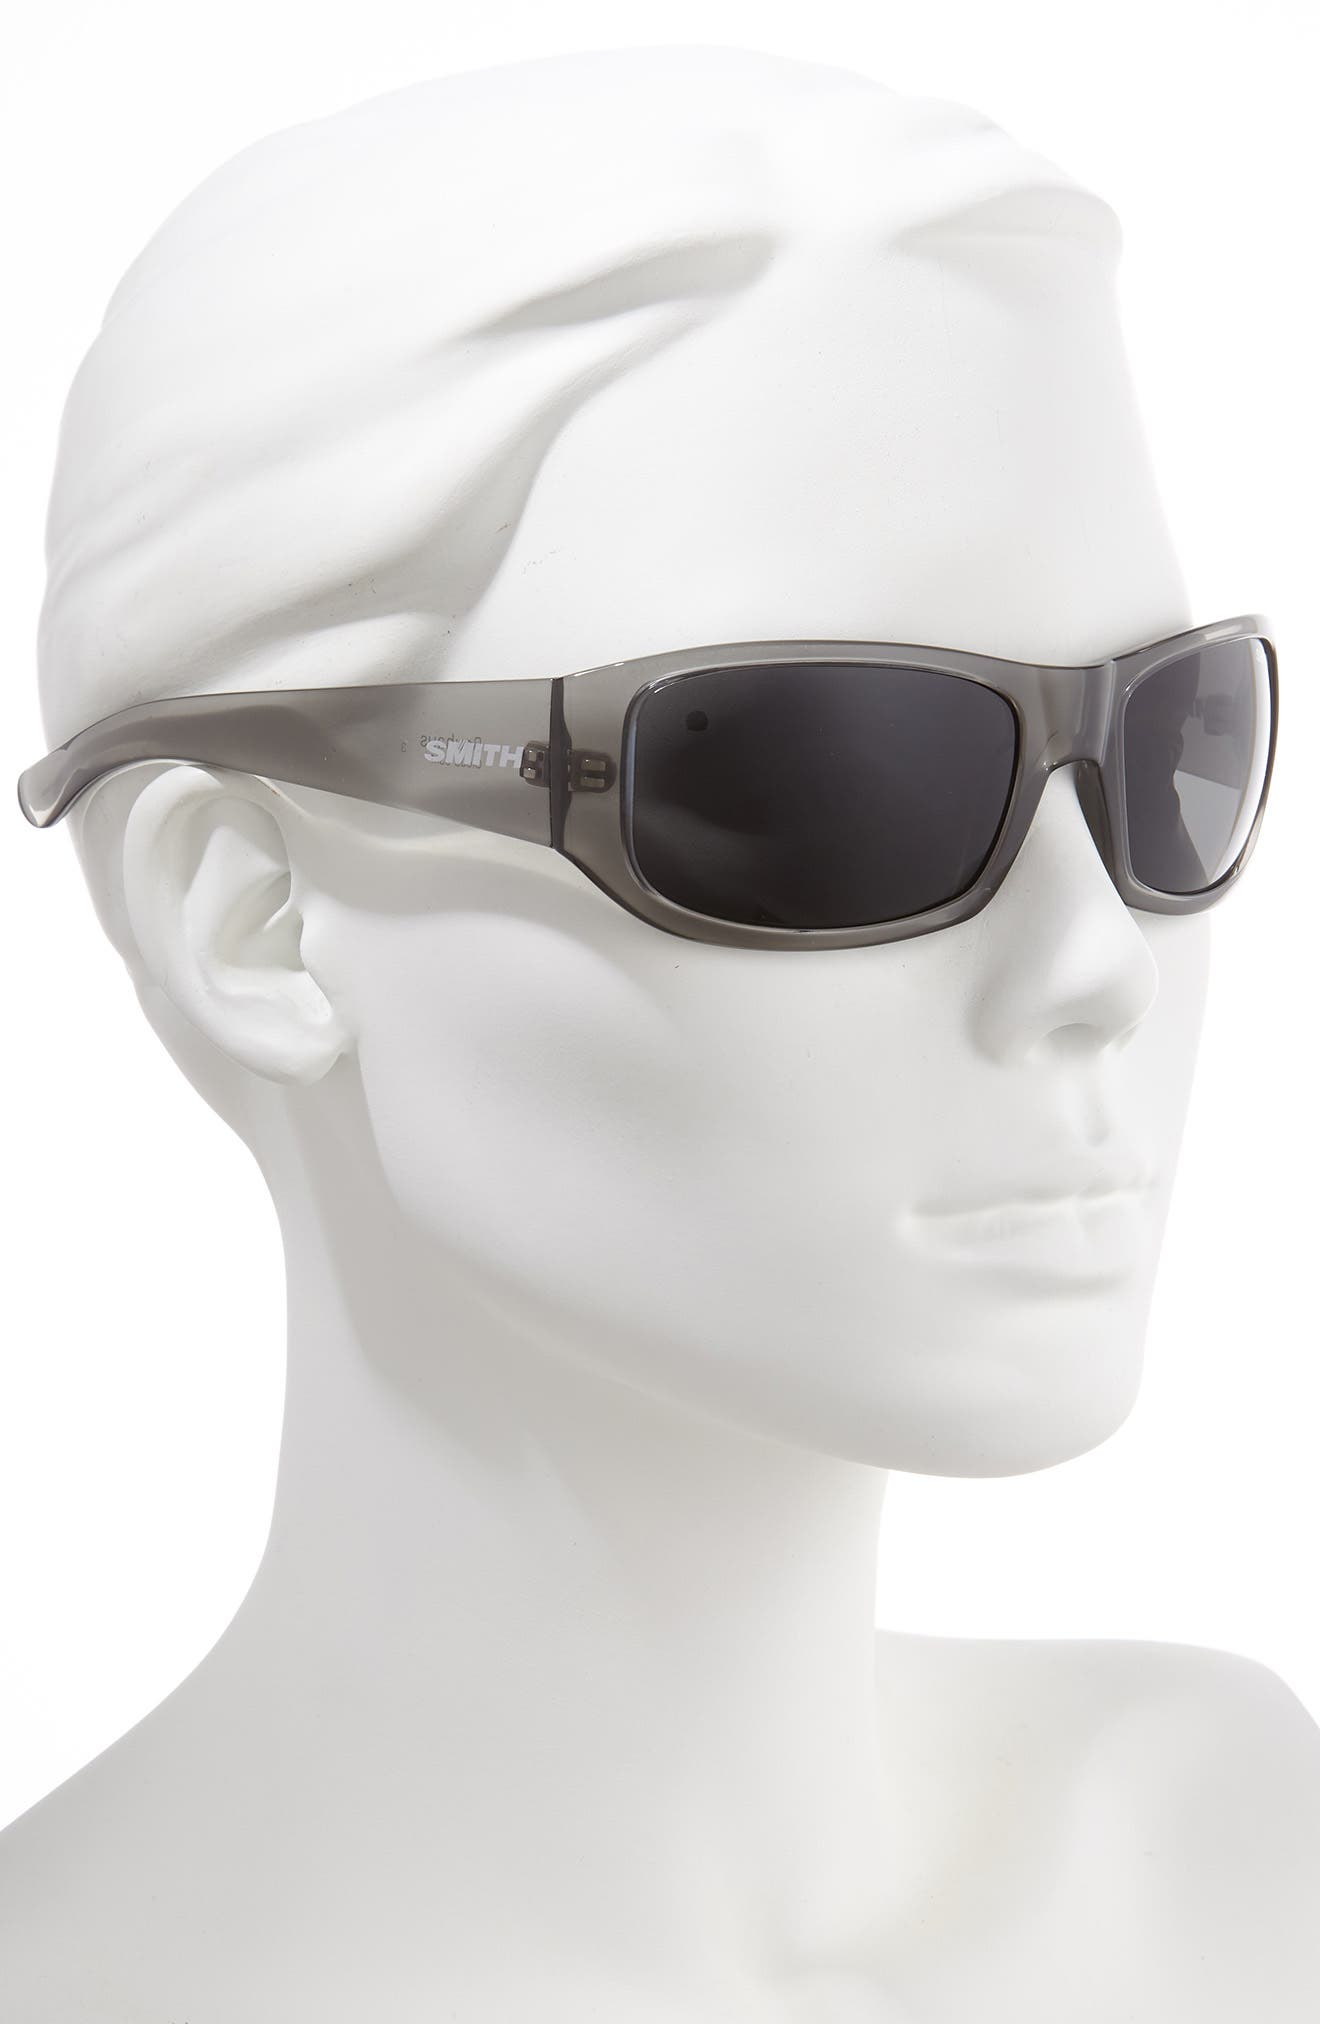 SMITH, Bauhaus 59mm ChromaPop<sup>™</sup> Polarized Wraparound Sunglasses, Alternate thumbnail 2, color, GREY CLOUD/ GREY